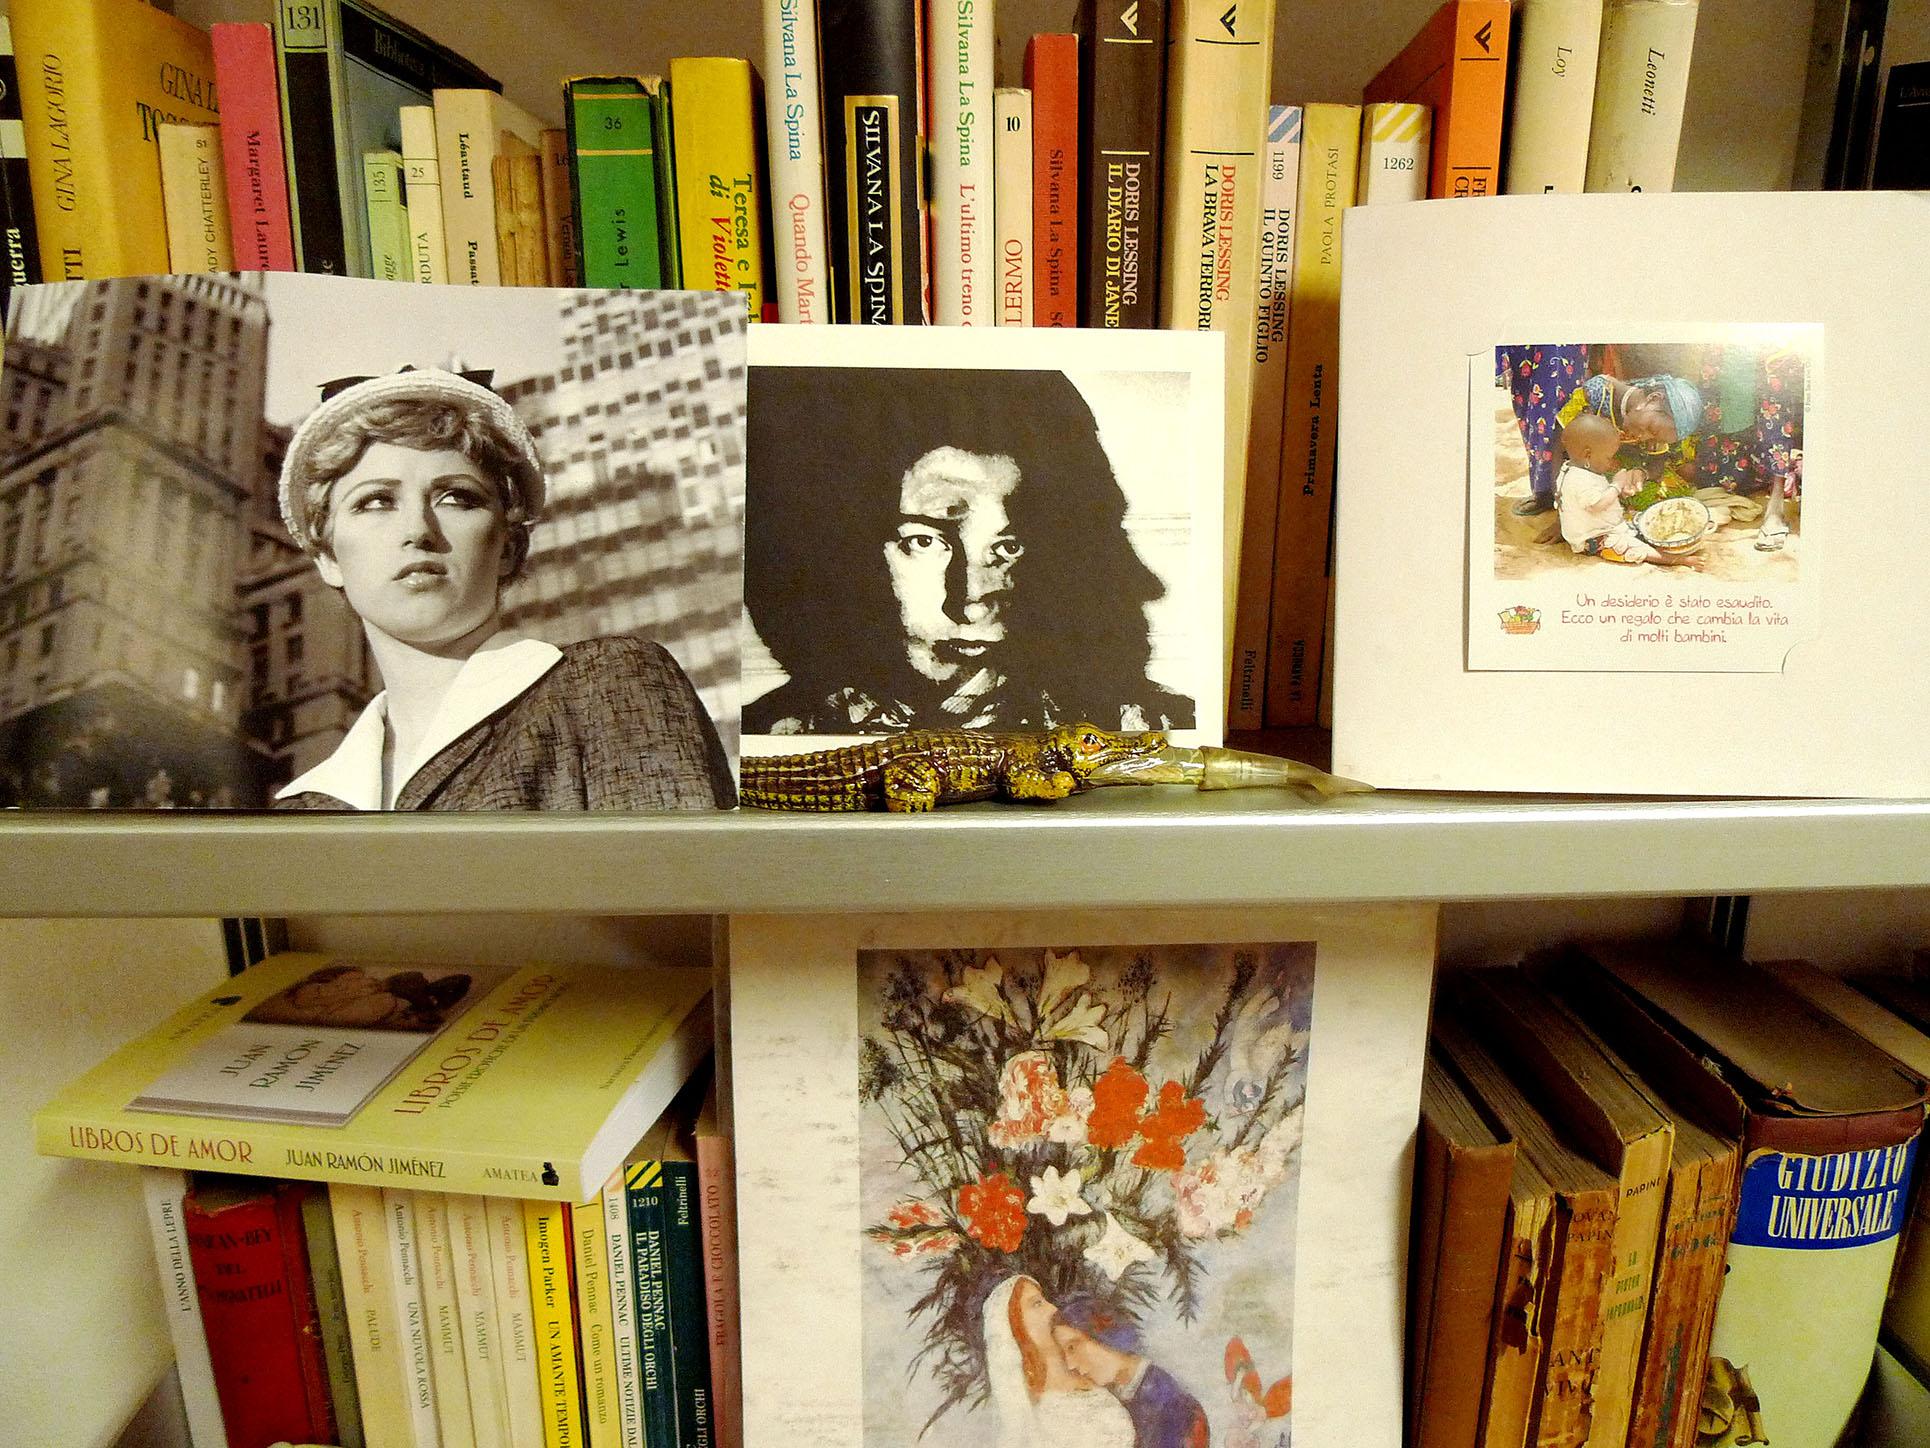 Bookshell at Augusto's, Milan (Photo: Barbara Fässler)